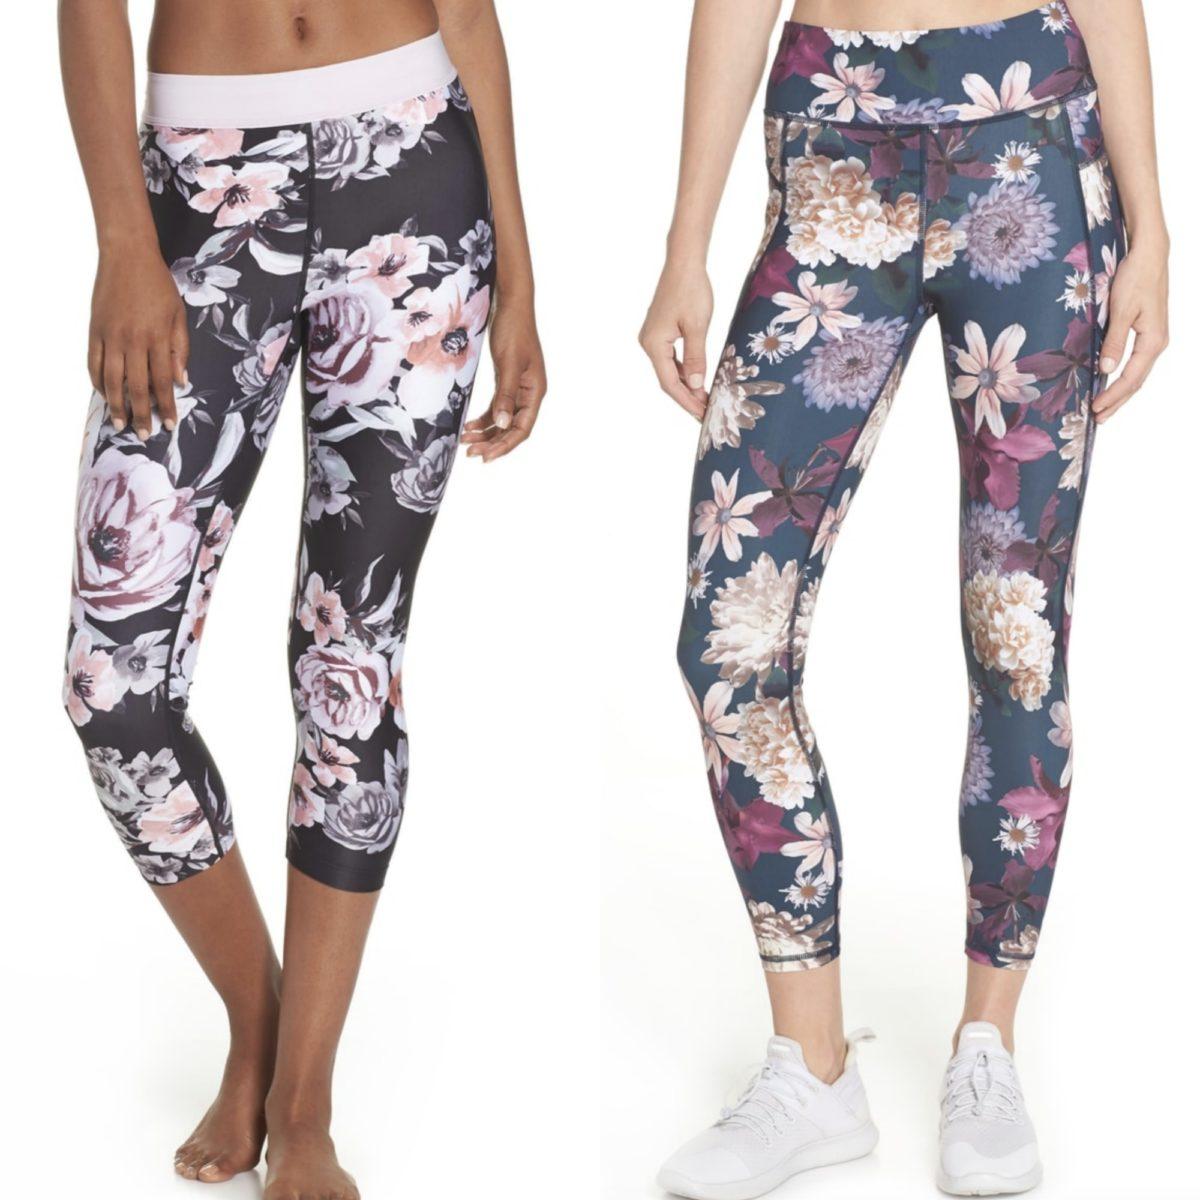 Nordstrom Anniversary Sale activewear floral leggings